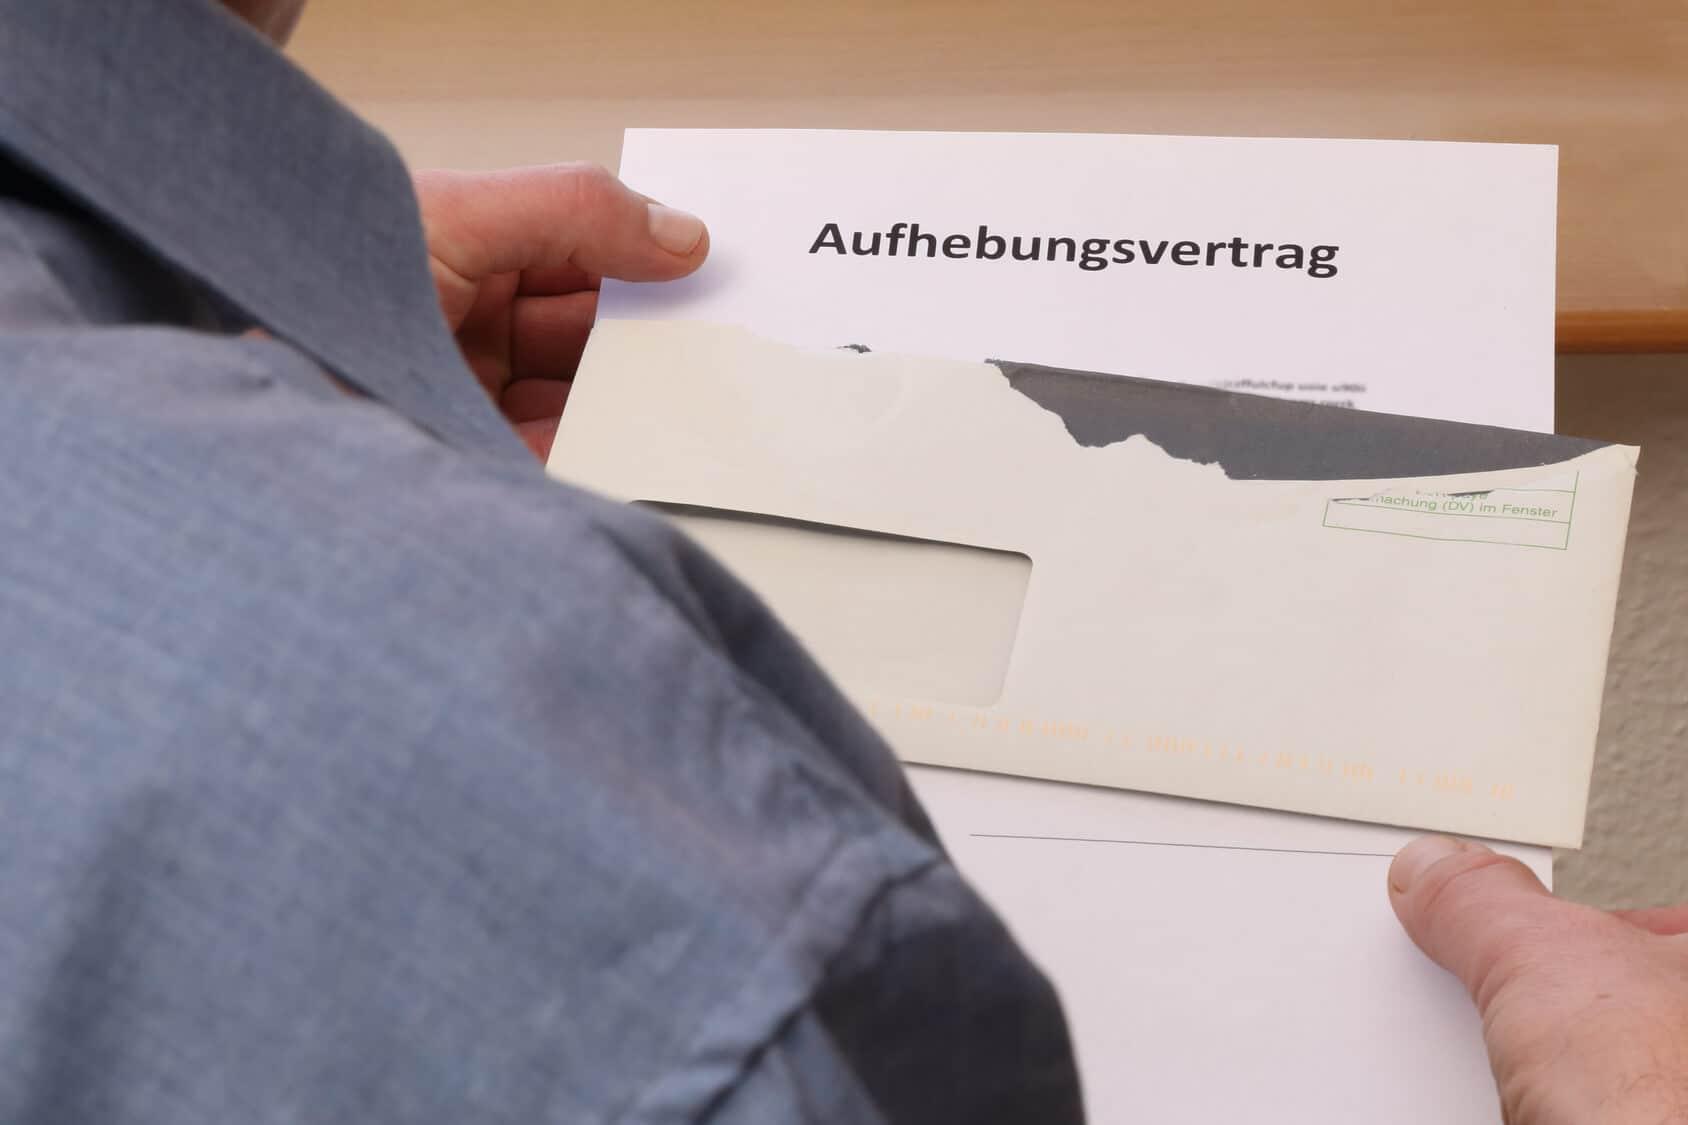 Aufhebungsvertrag © Fotolia/Joachim Lechner